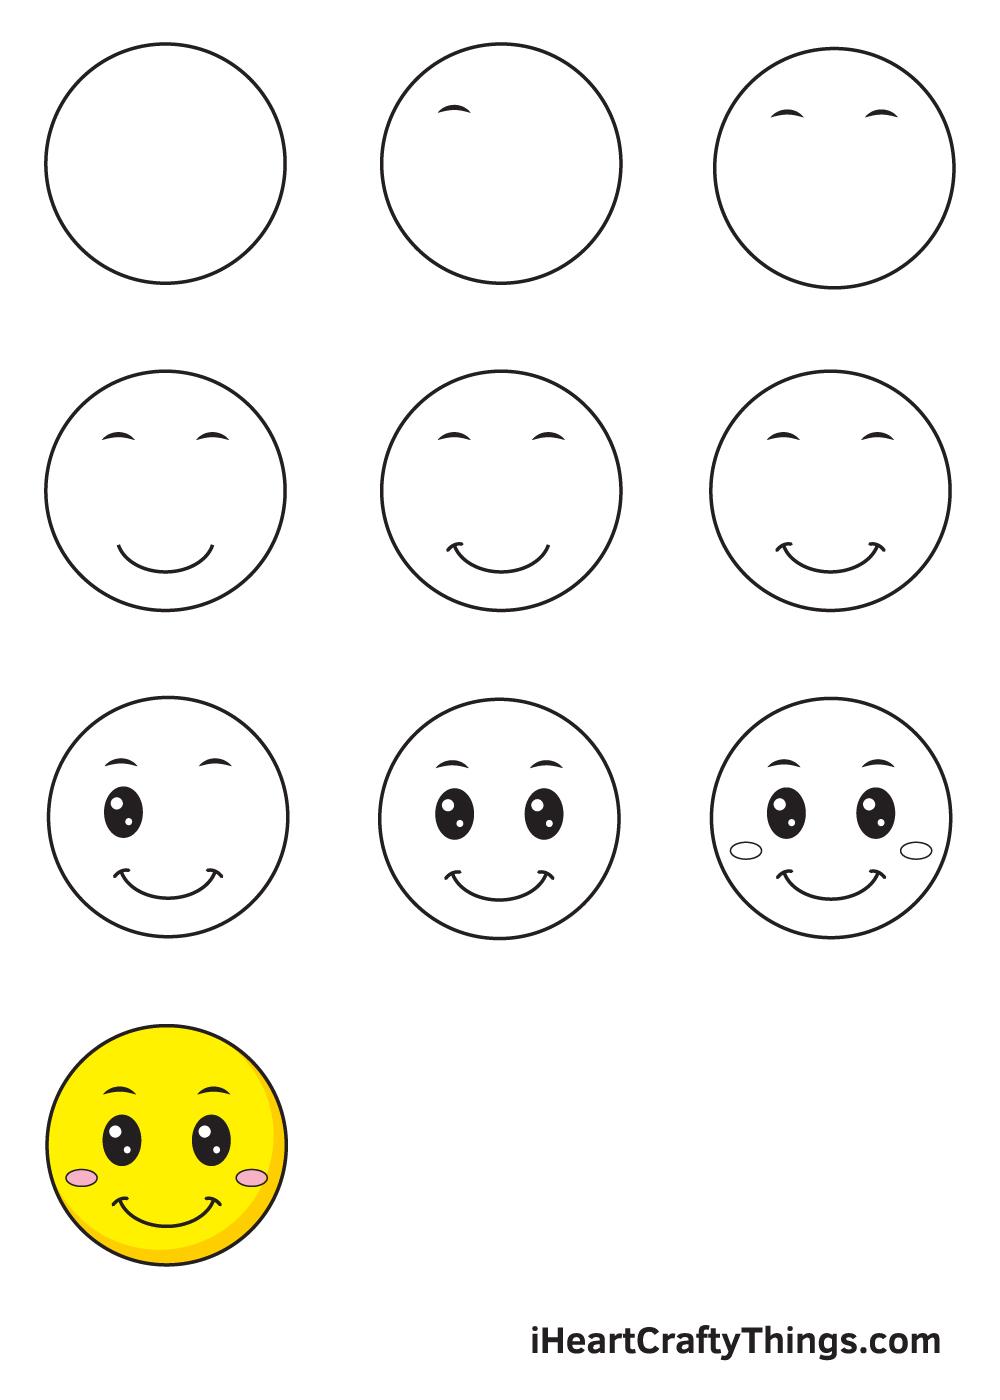 drawing smile in 9 easy steps